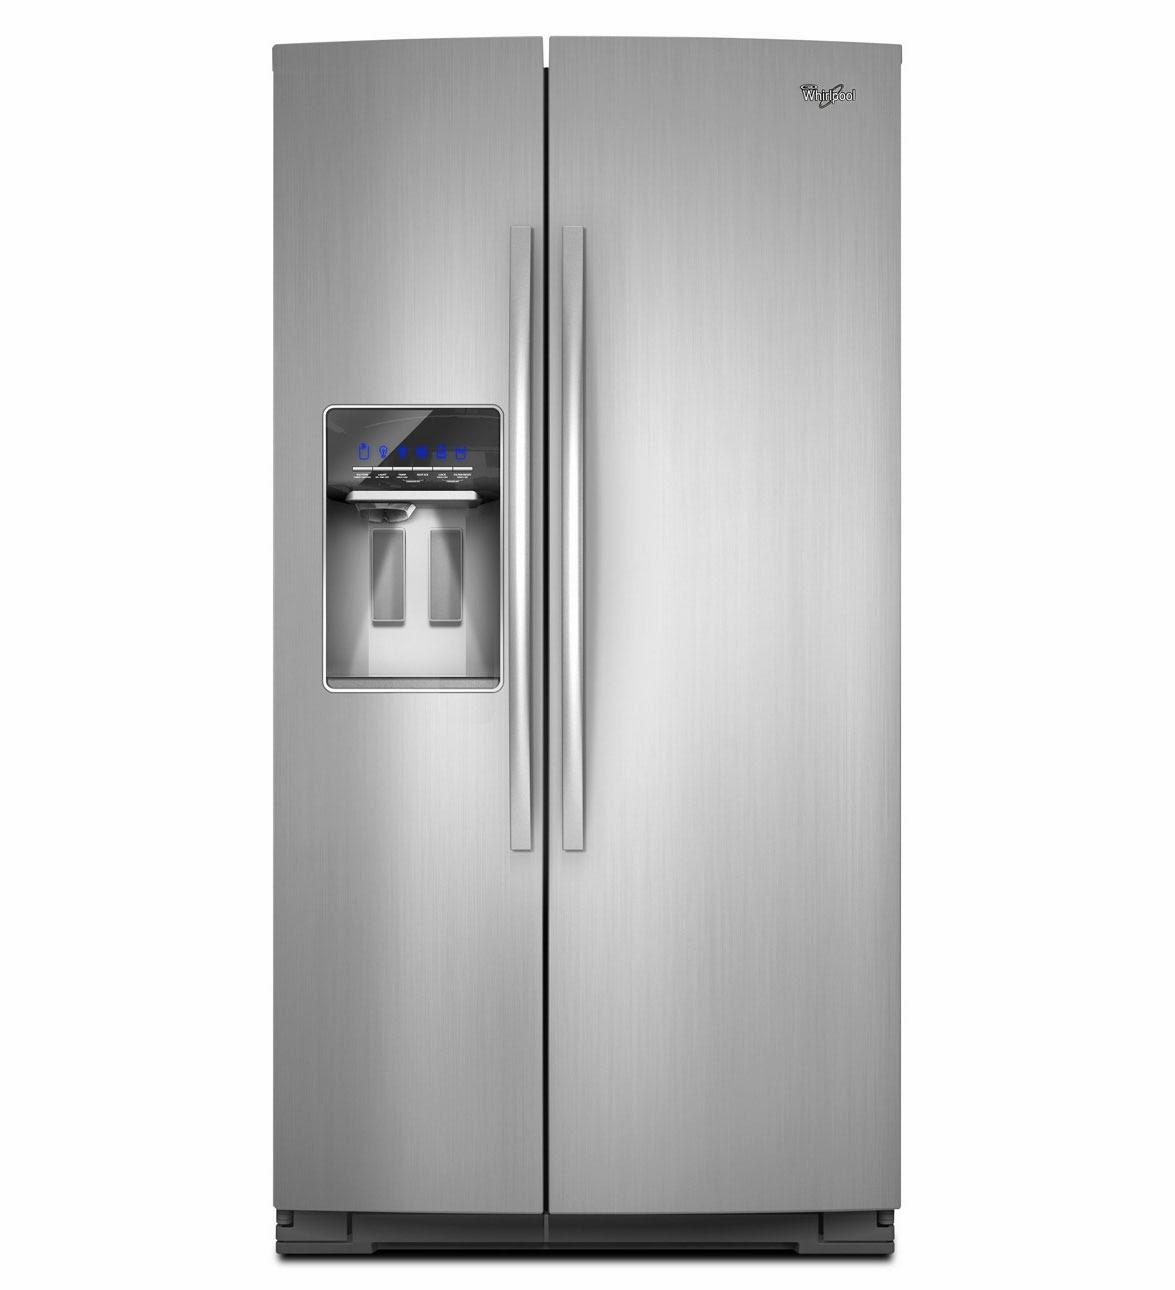 Whirlpool Refrigerator Brand Gss26c4xxy Whirlpool